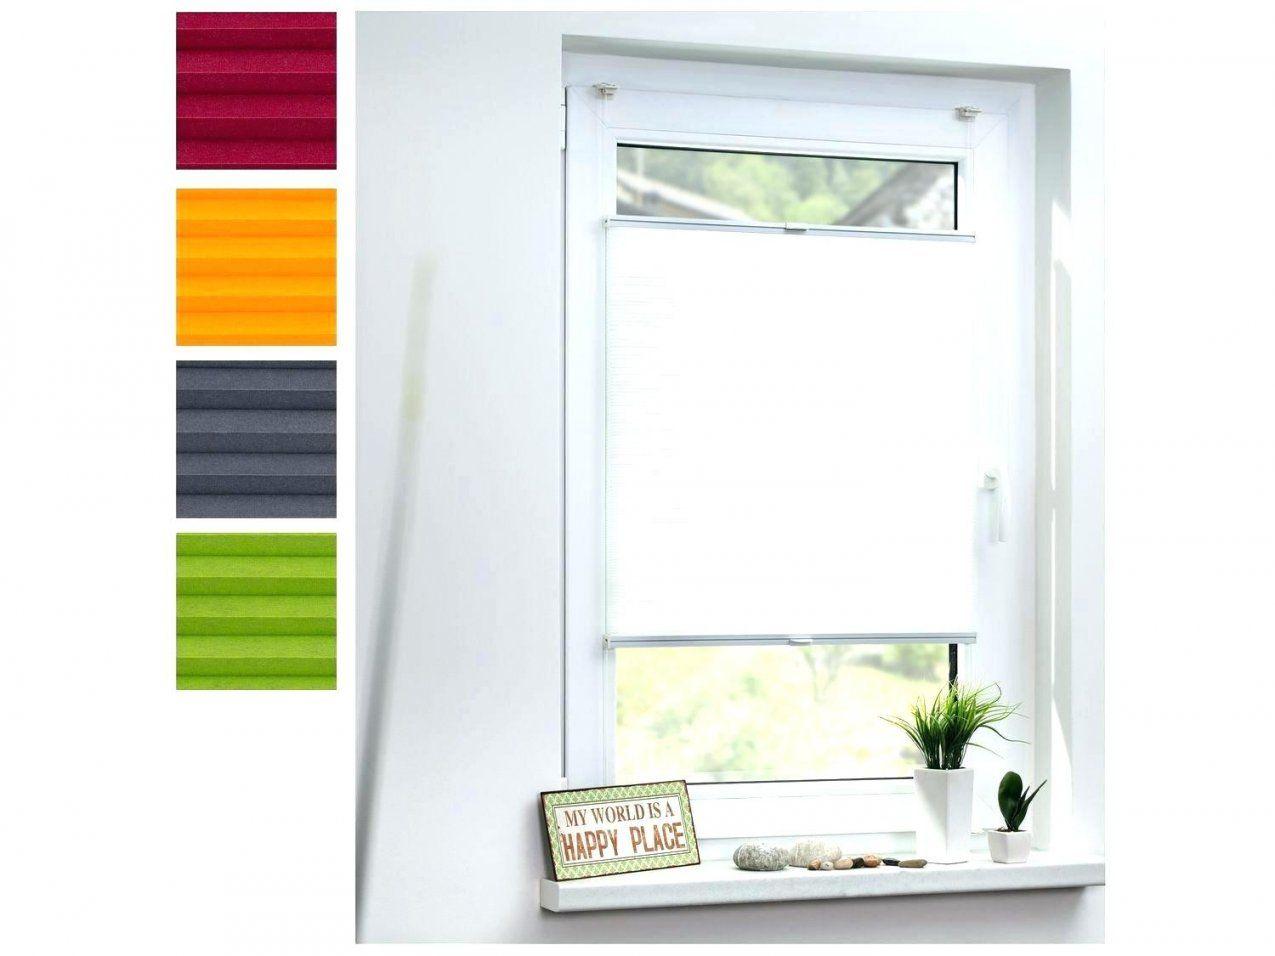 Ikea Fensterrollos Awesome Crafty Ideas Plissee Rollo Ikea von Fenster Rollos Innen Ikea Bild